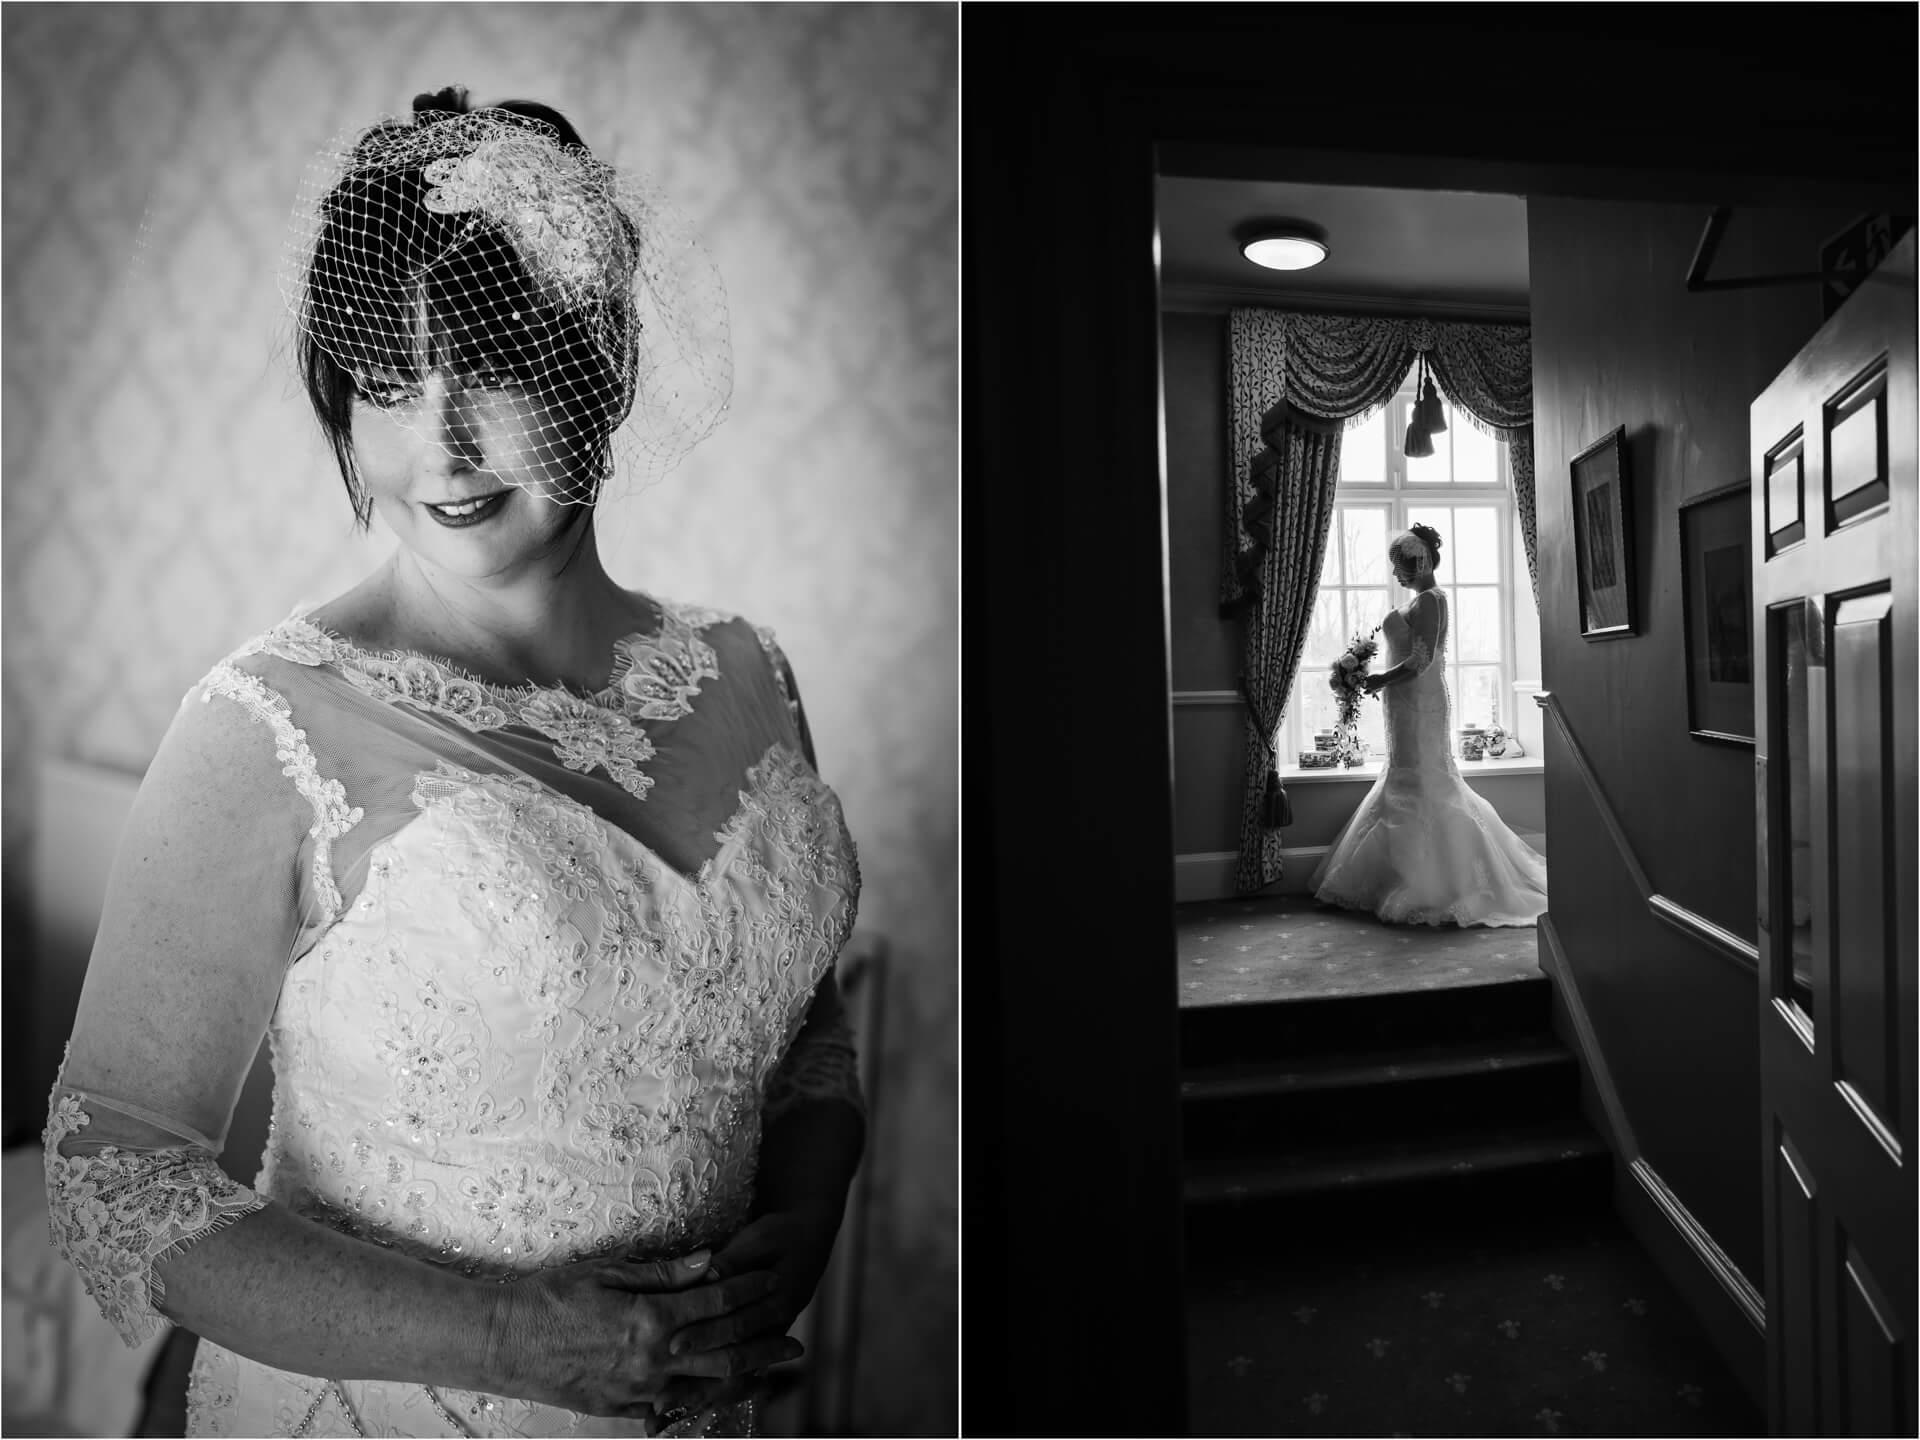 Hazlewood Castle wedding photographer - bridal preparations